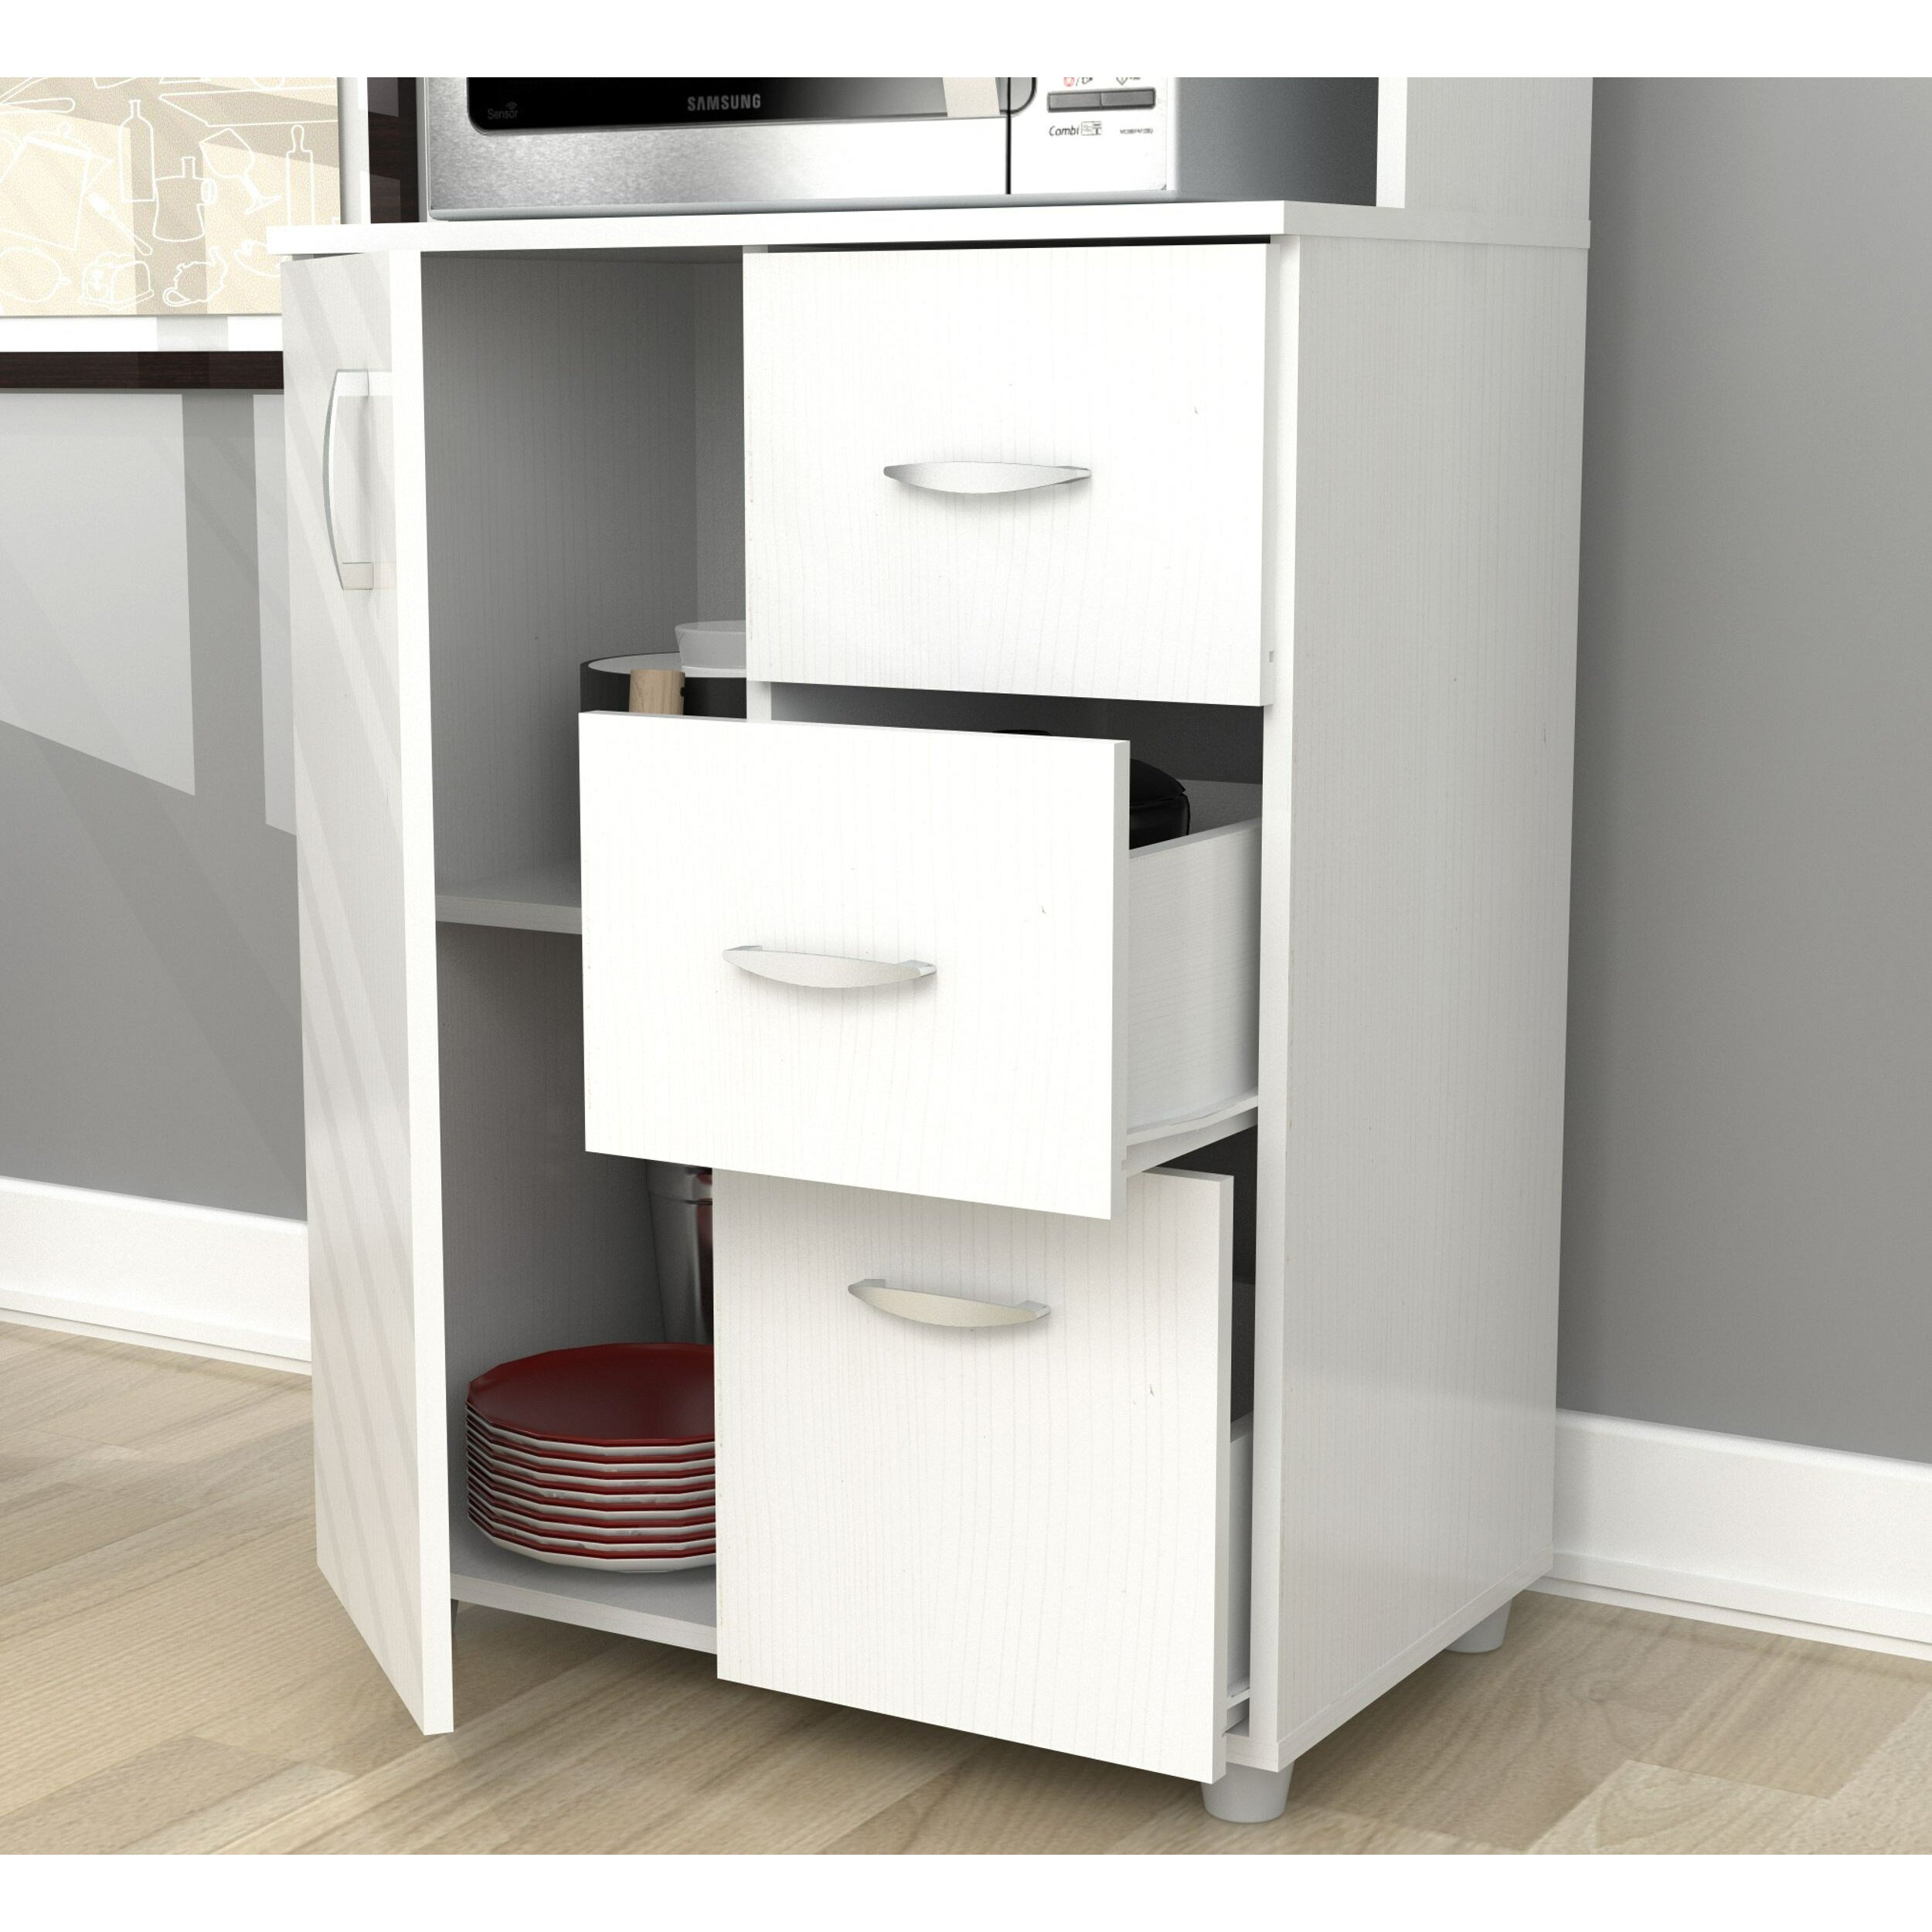 Inval inval kitchen cabinet reviews wayfair for Wayfair kitchen cabinets